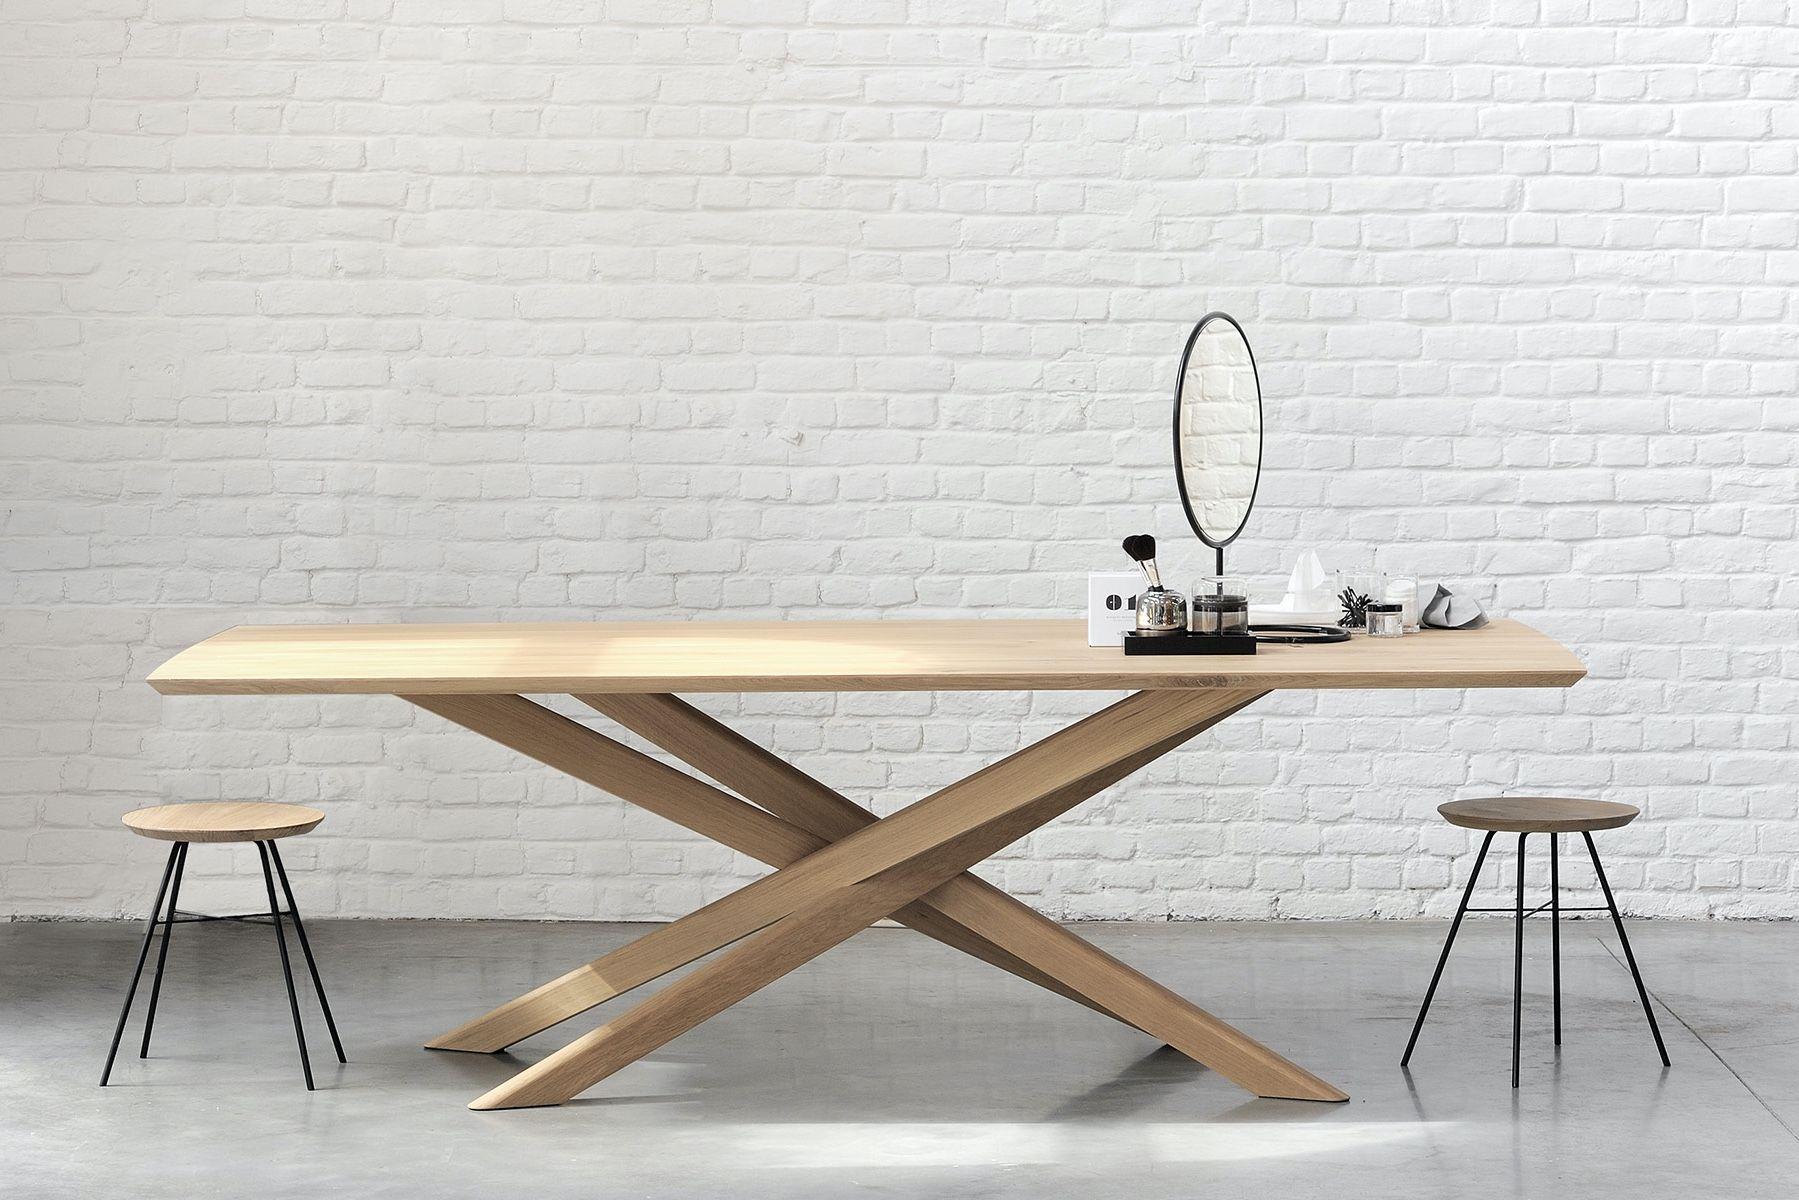 Ethnicraft Mikado Dining Table